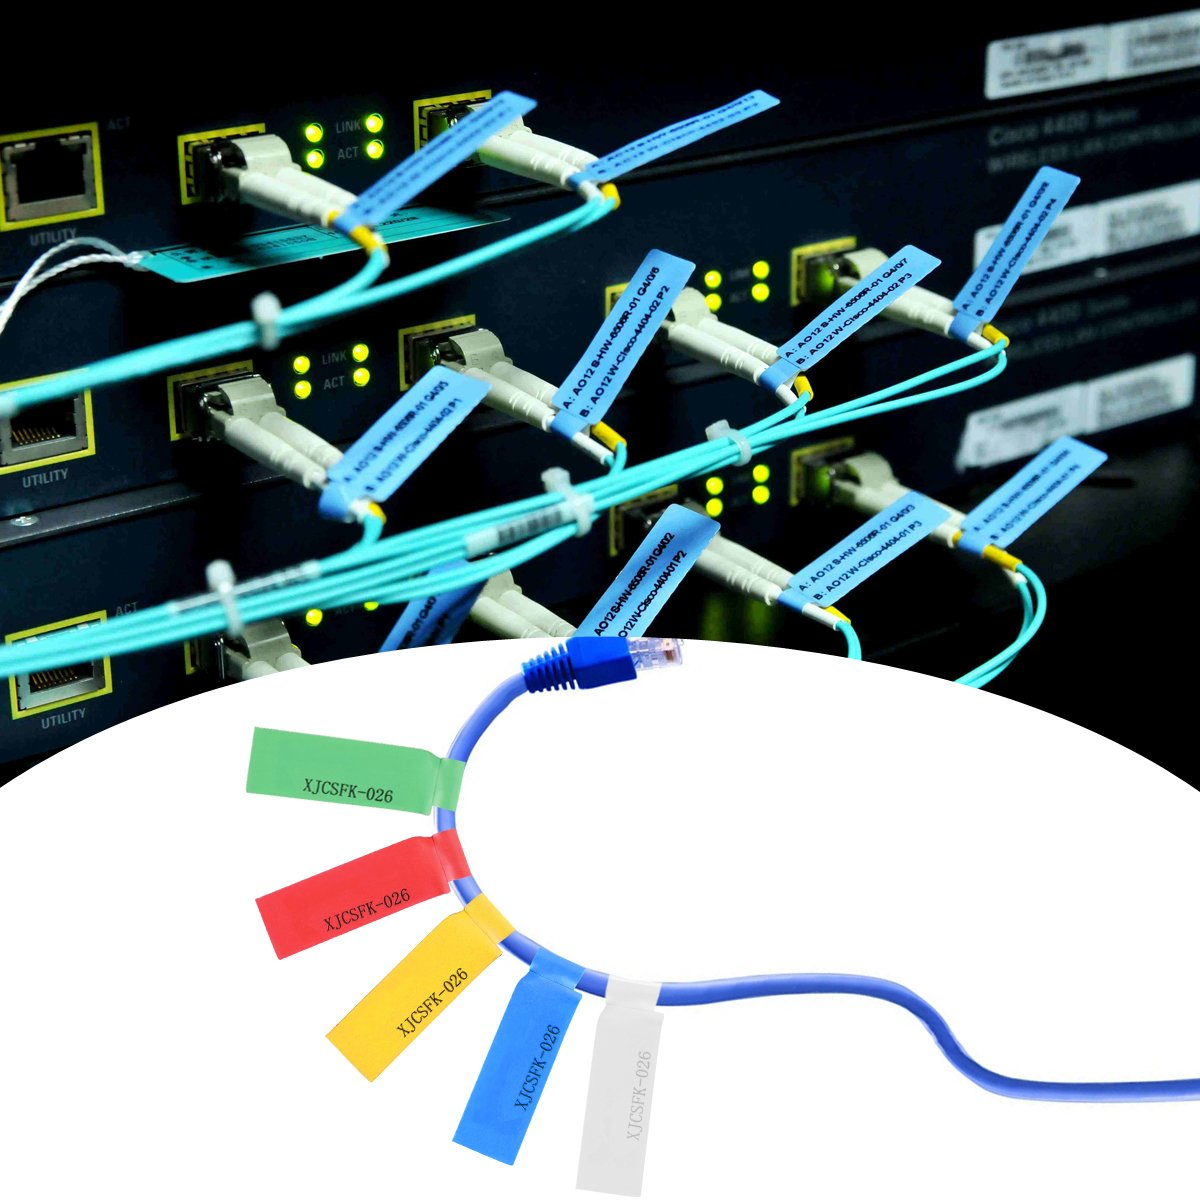 Kabel Etiketten,LANMU selbstklebendes Kabel Label Aufkleber zur ...